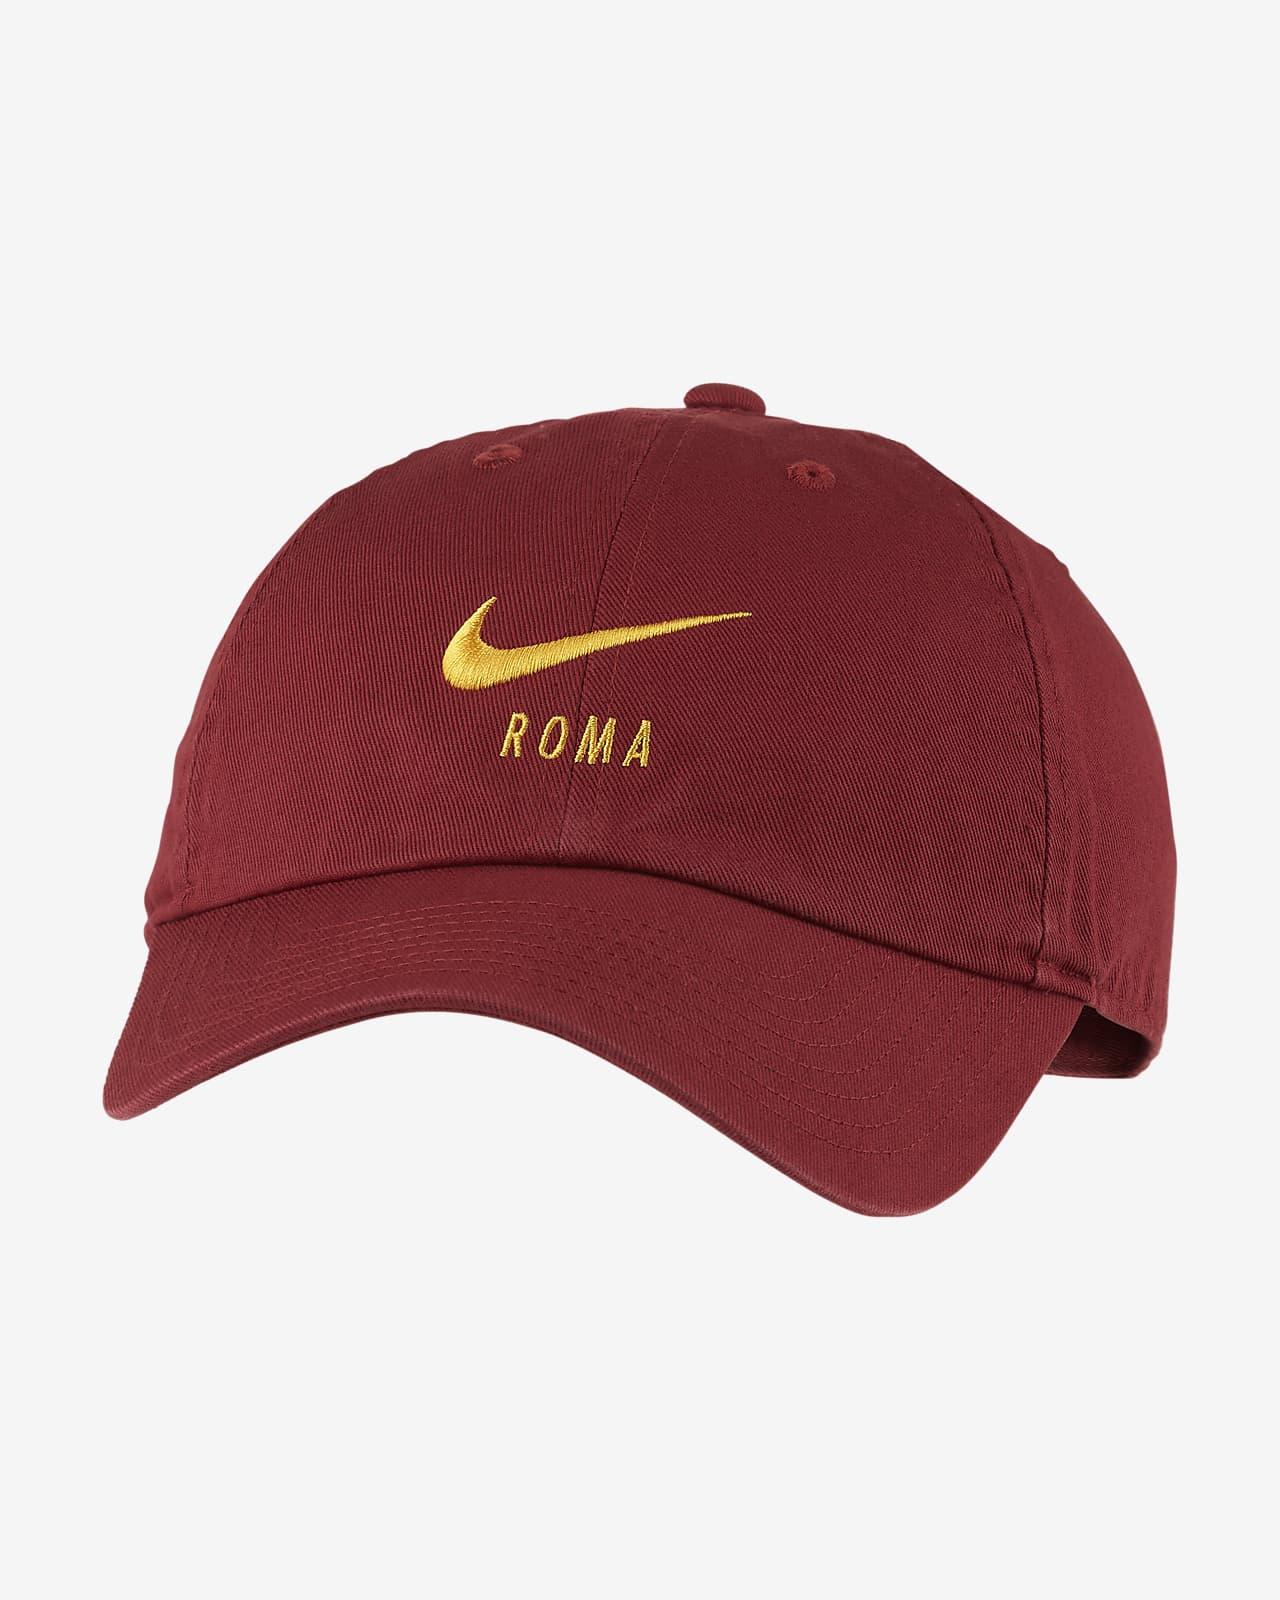 A.S. Roma Heritage86 Adjustable Hat